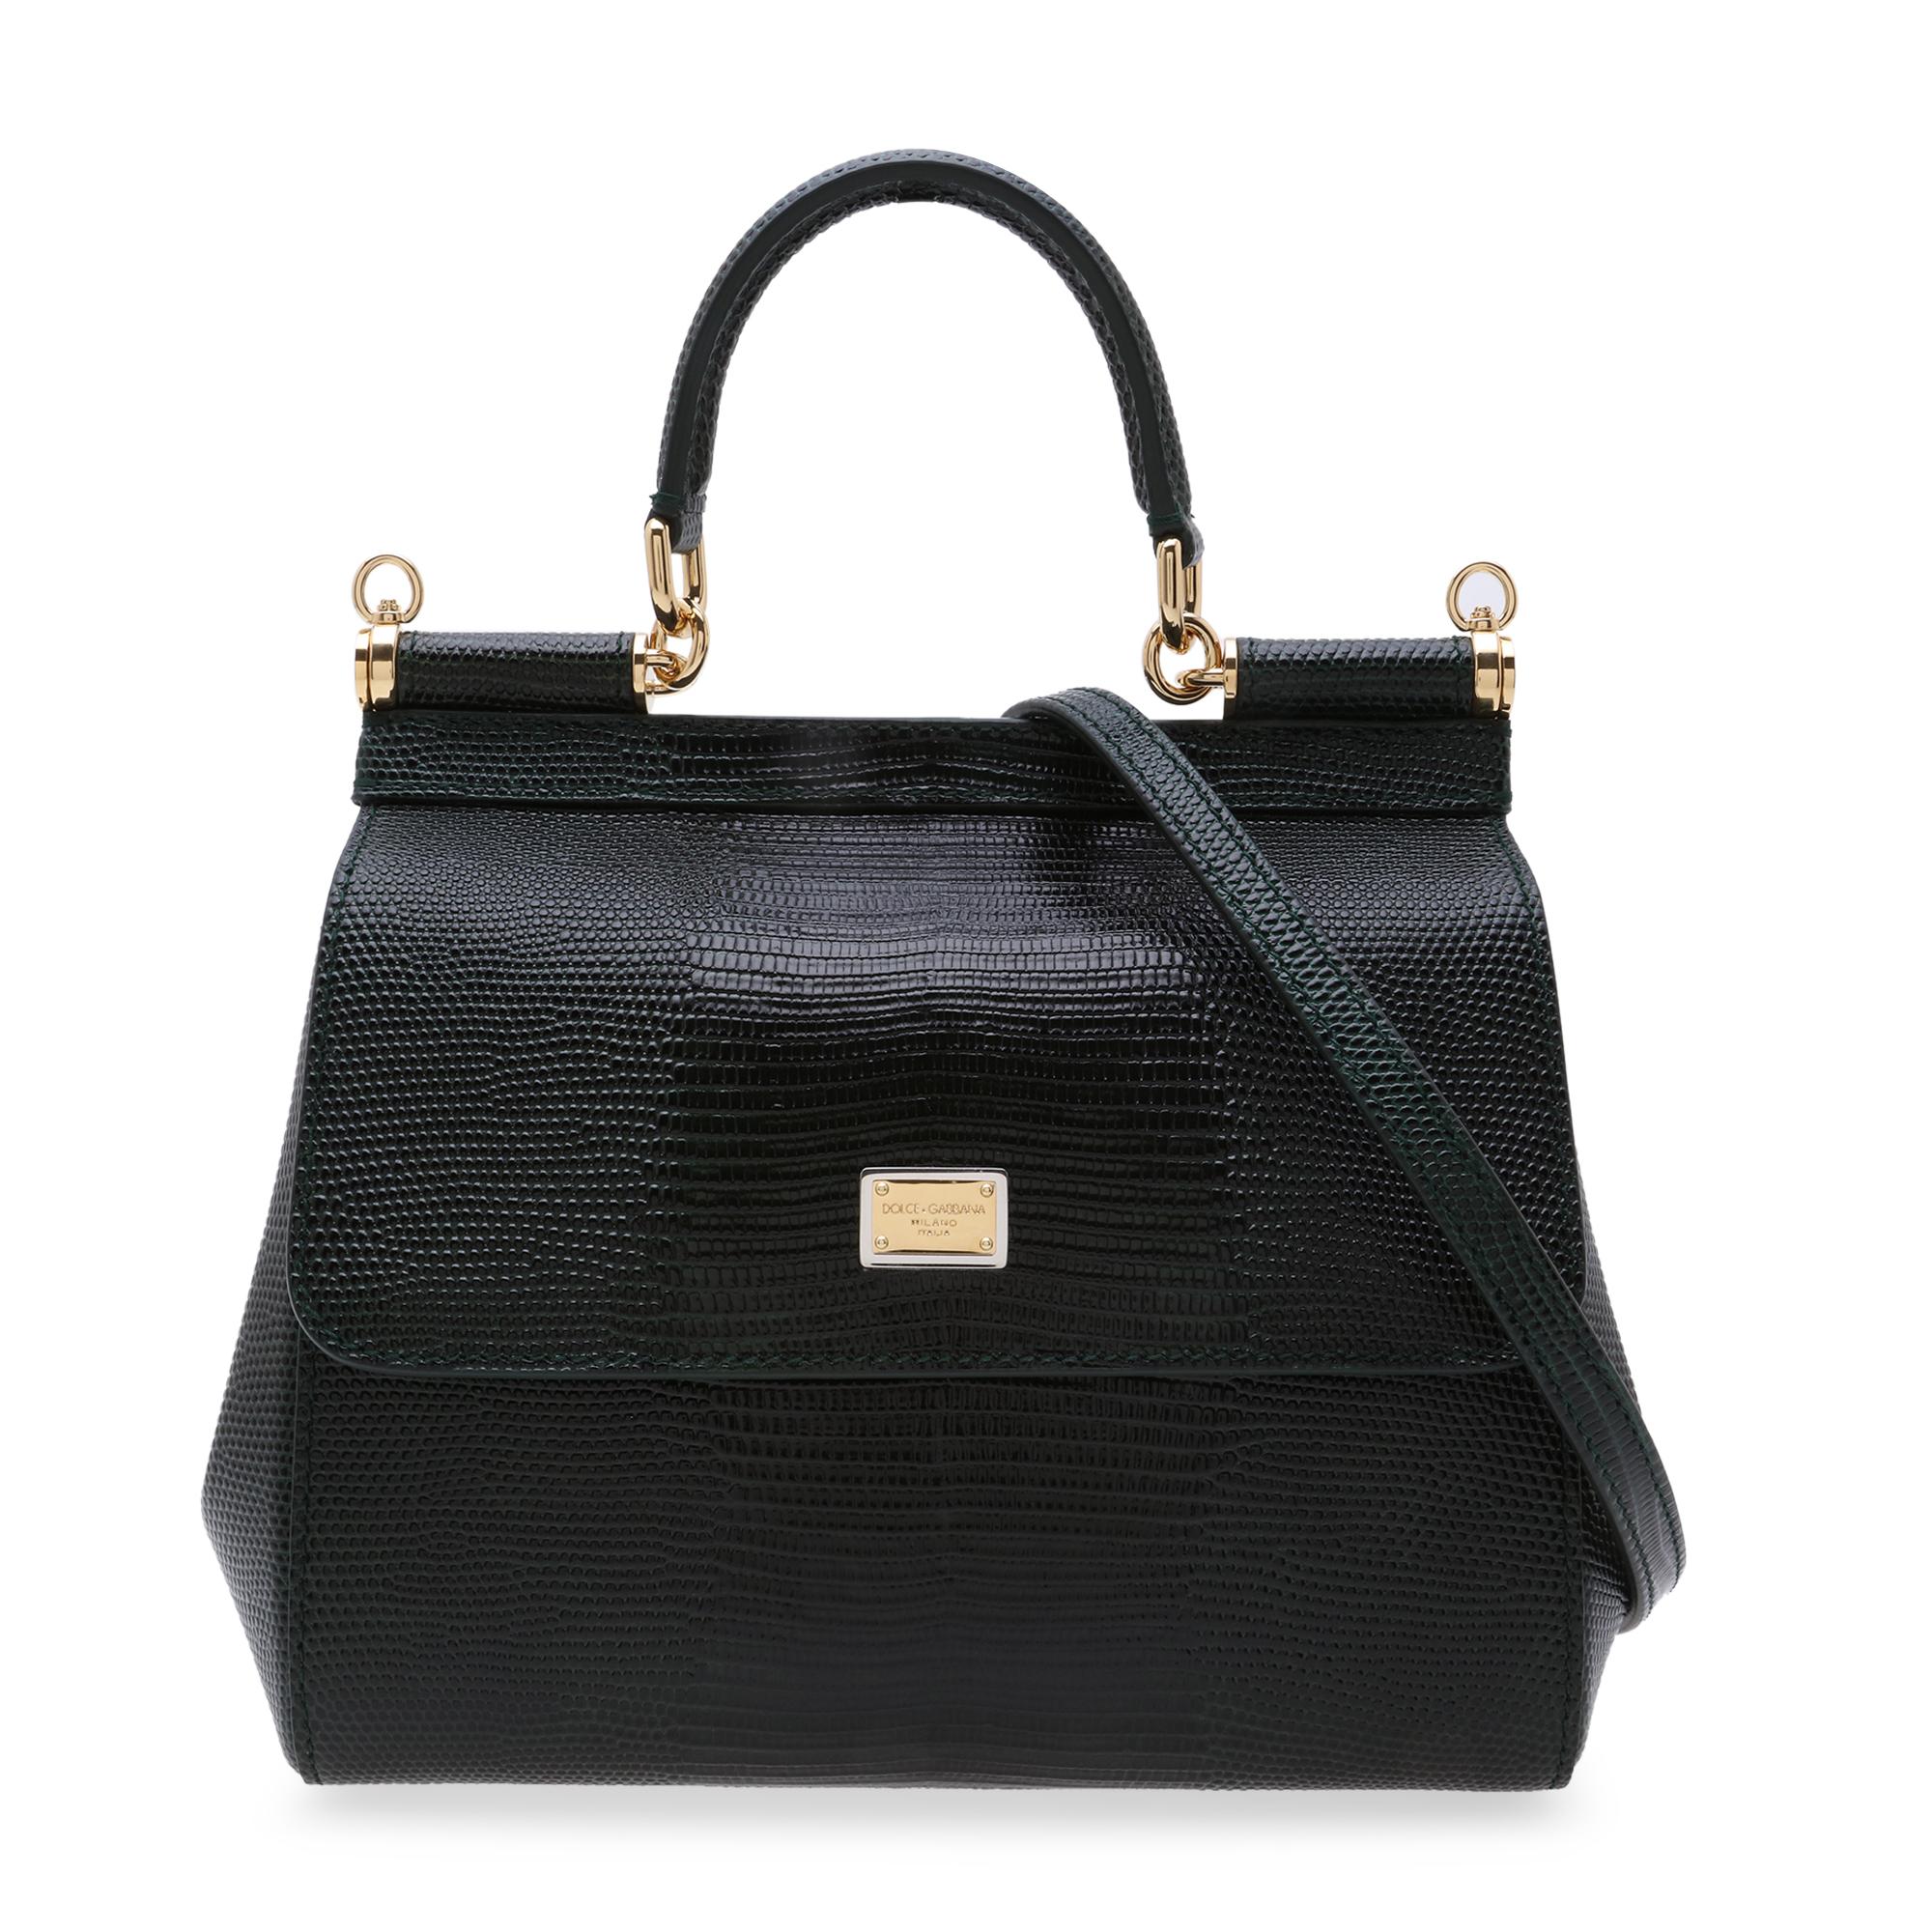 Sicily bag